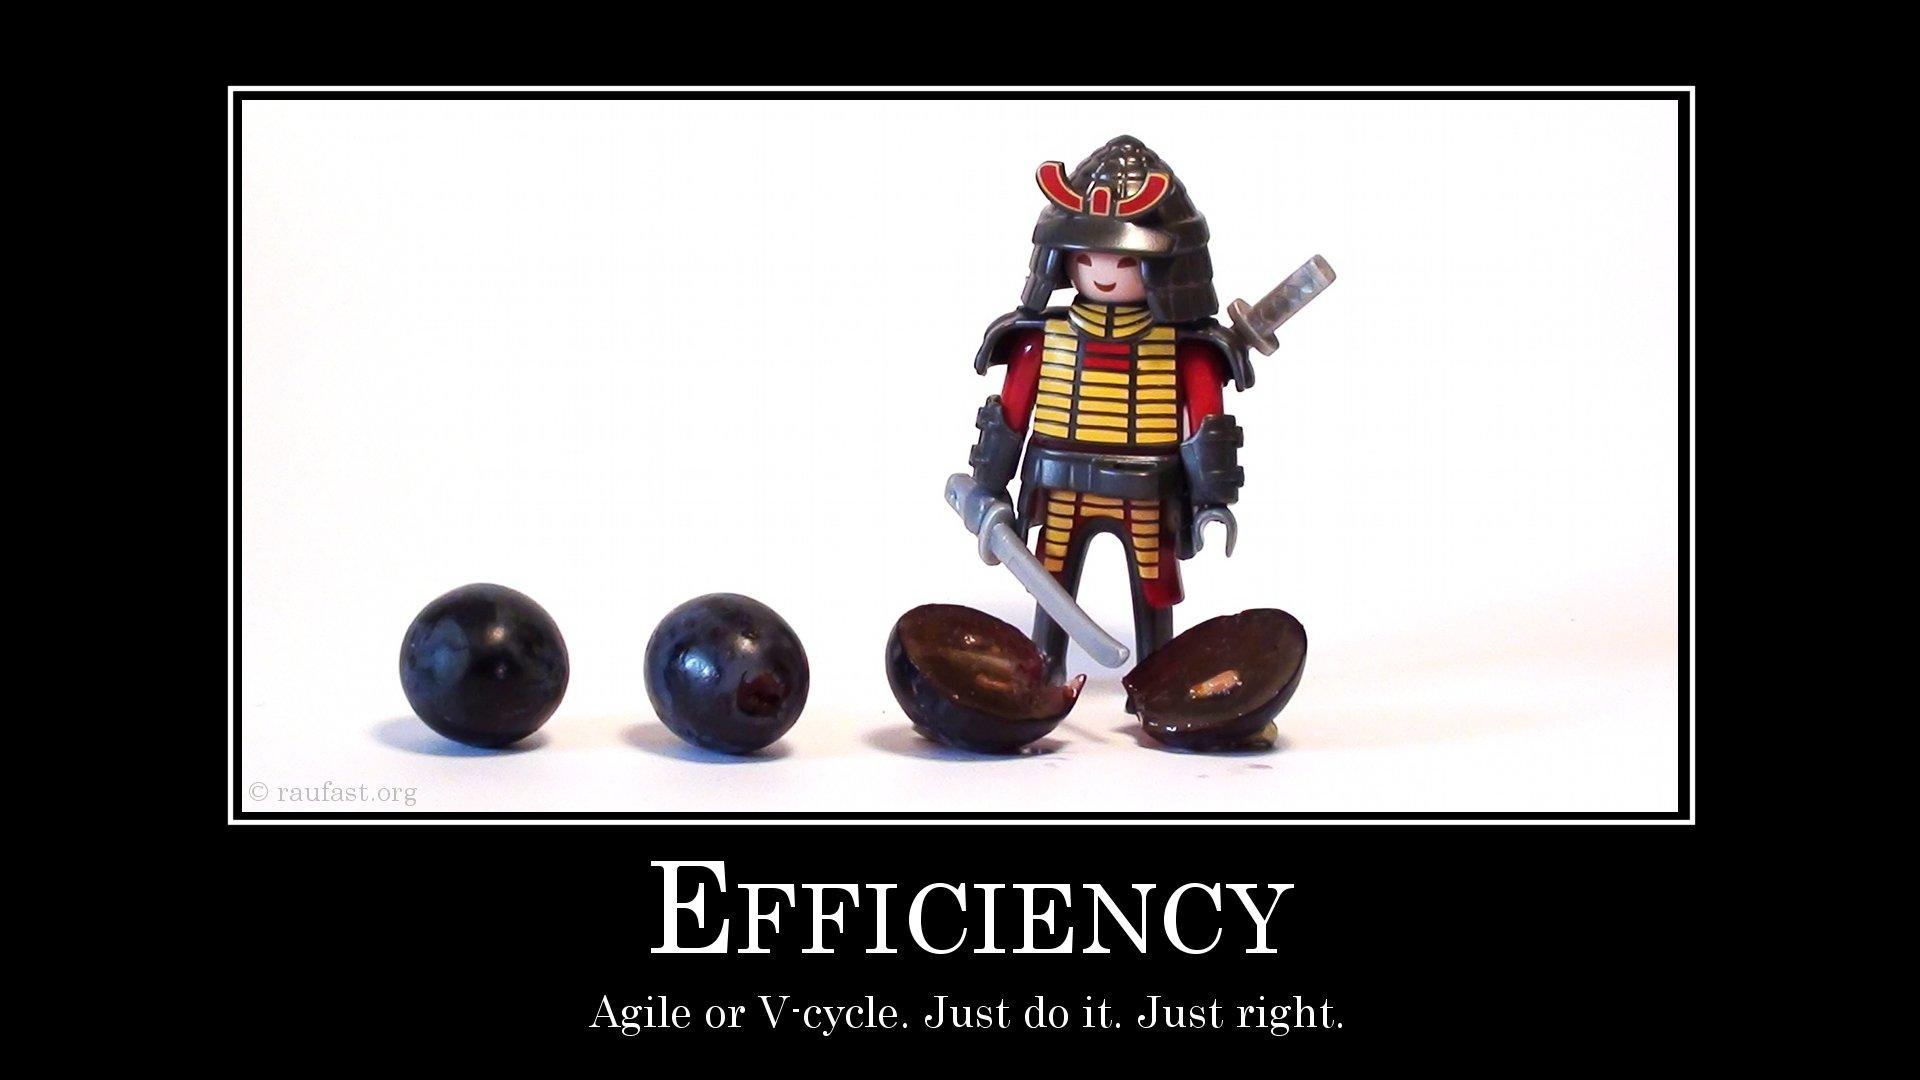 Playmobil Motivational Poster